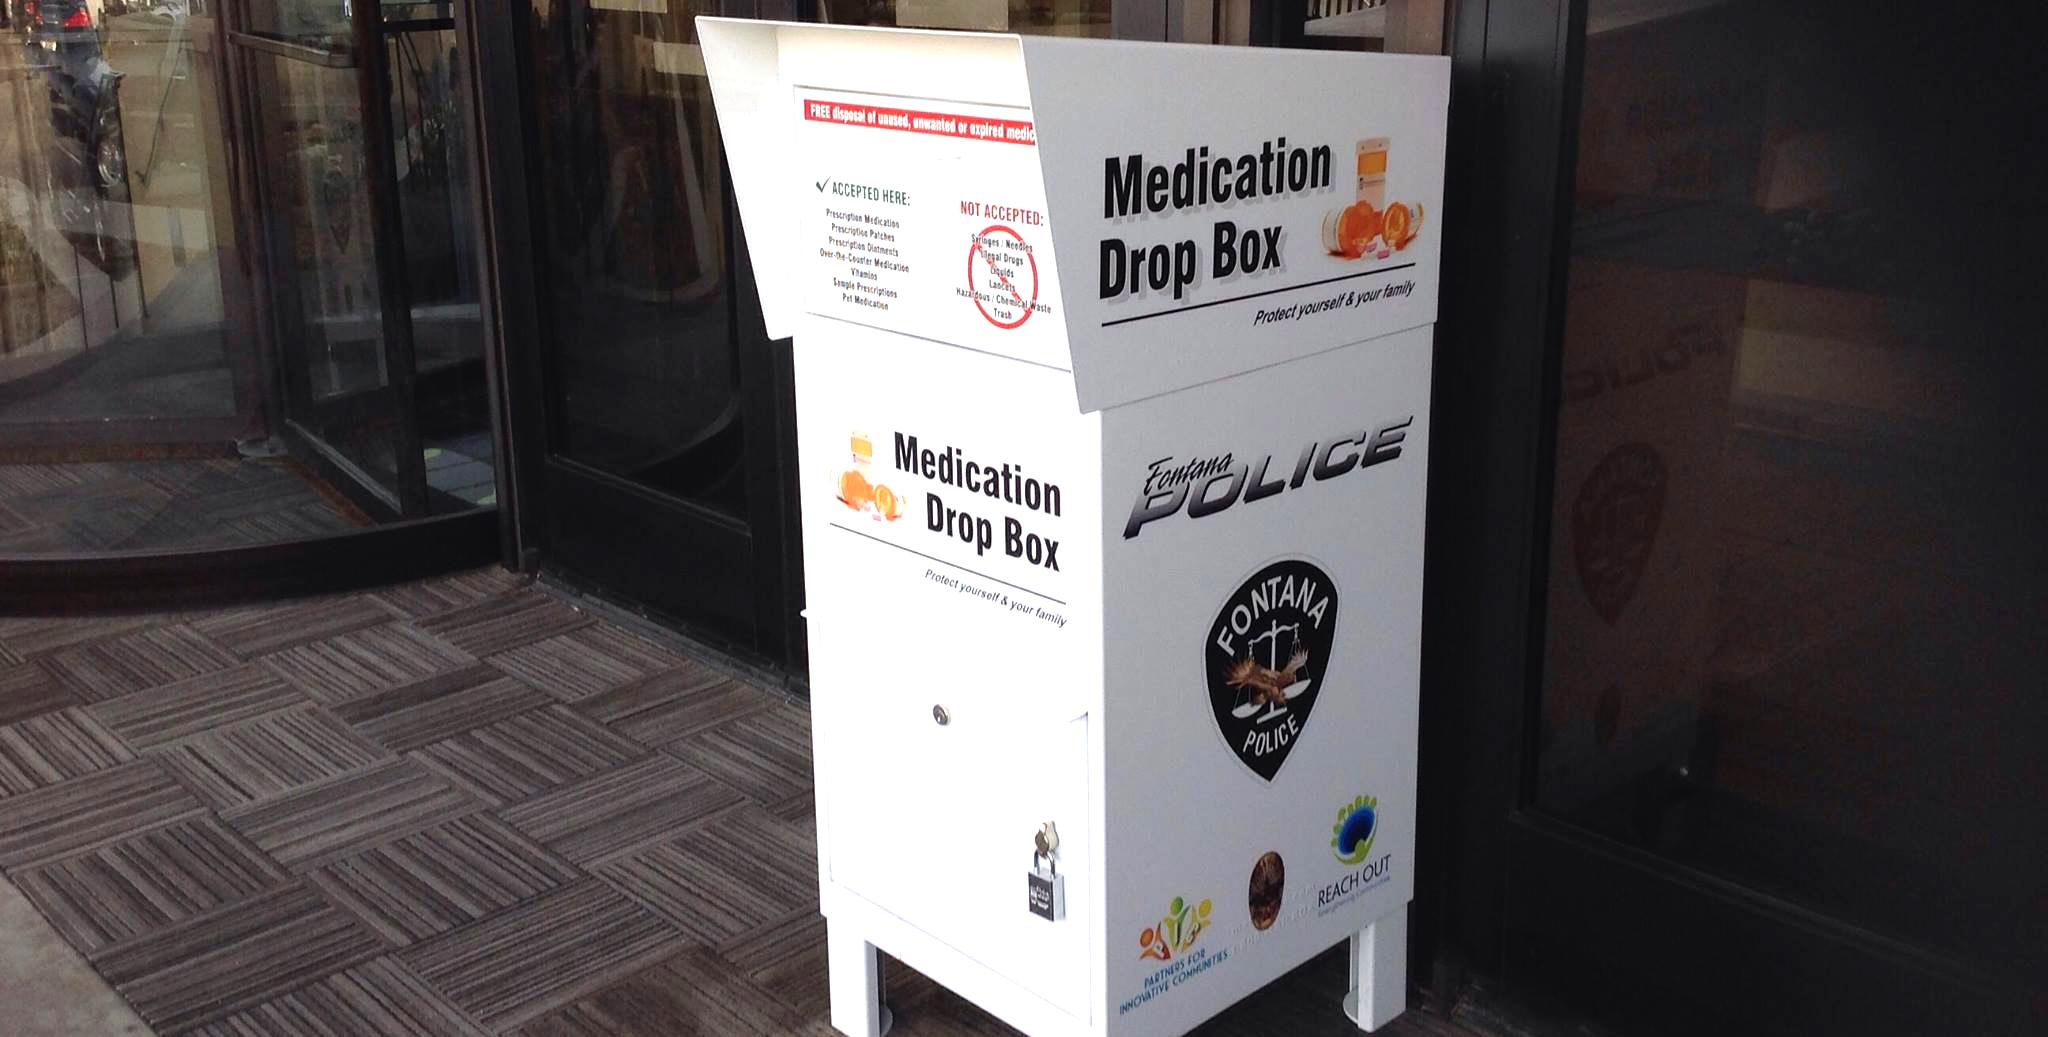 Medication Drop Box horizontal